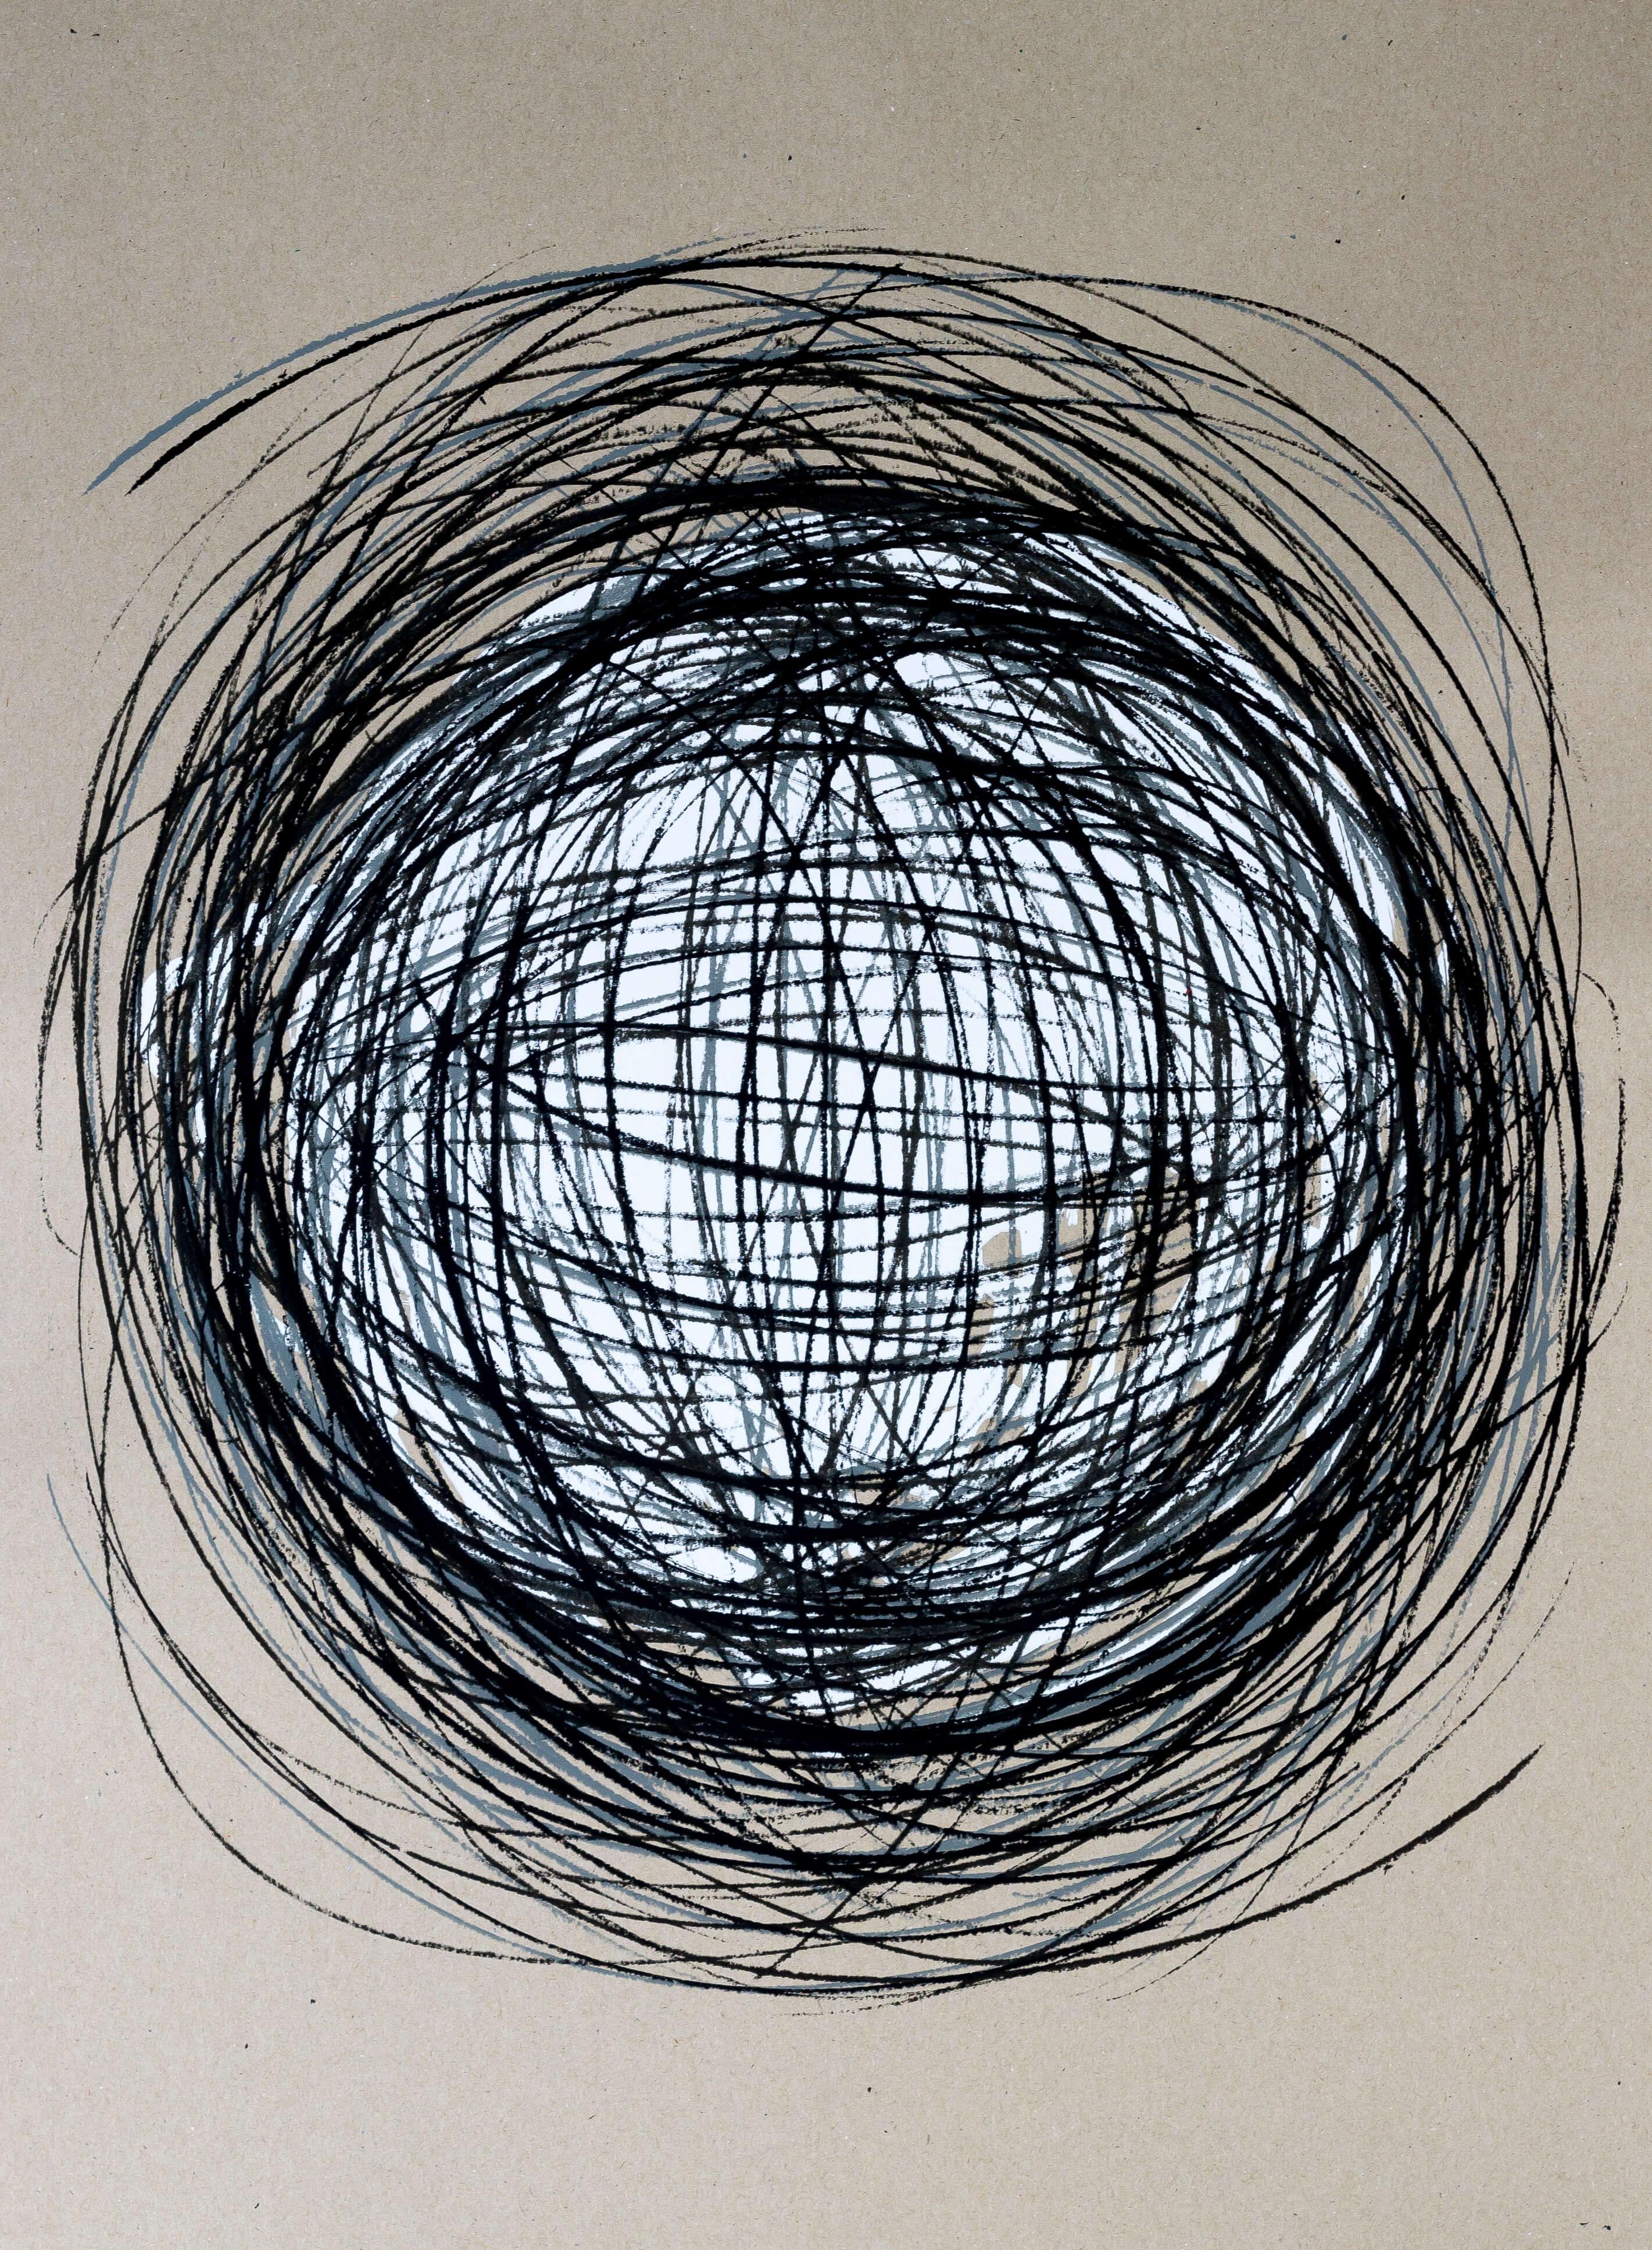 Katharina Albers, Transformation XXXVI, 2011, Siebdruck, Unikat, 59,5x42cm